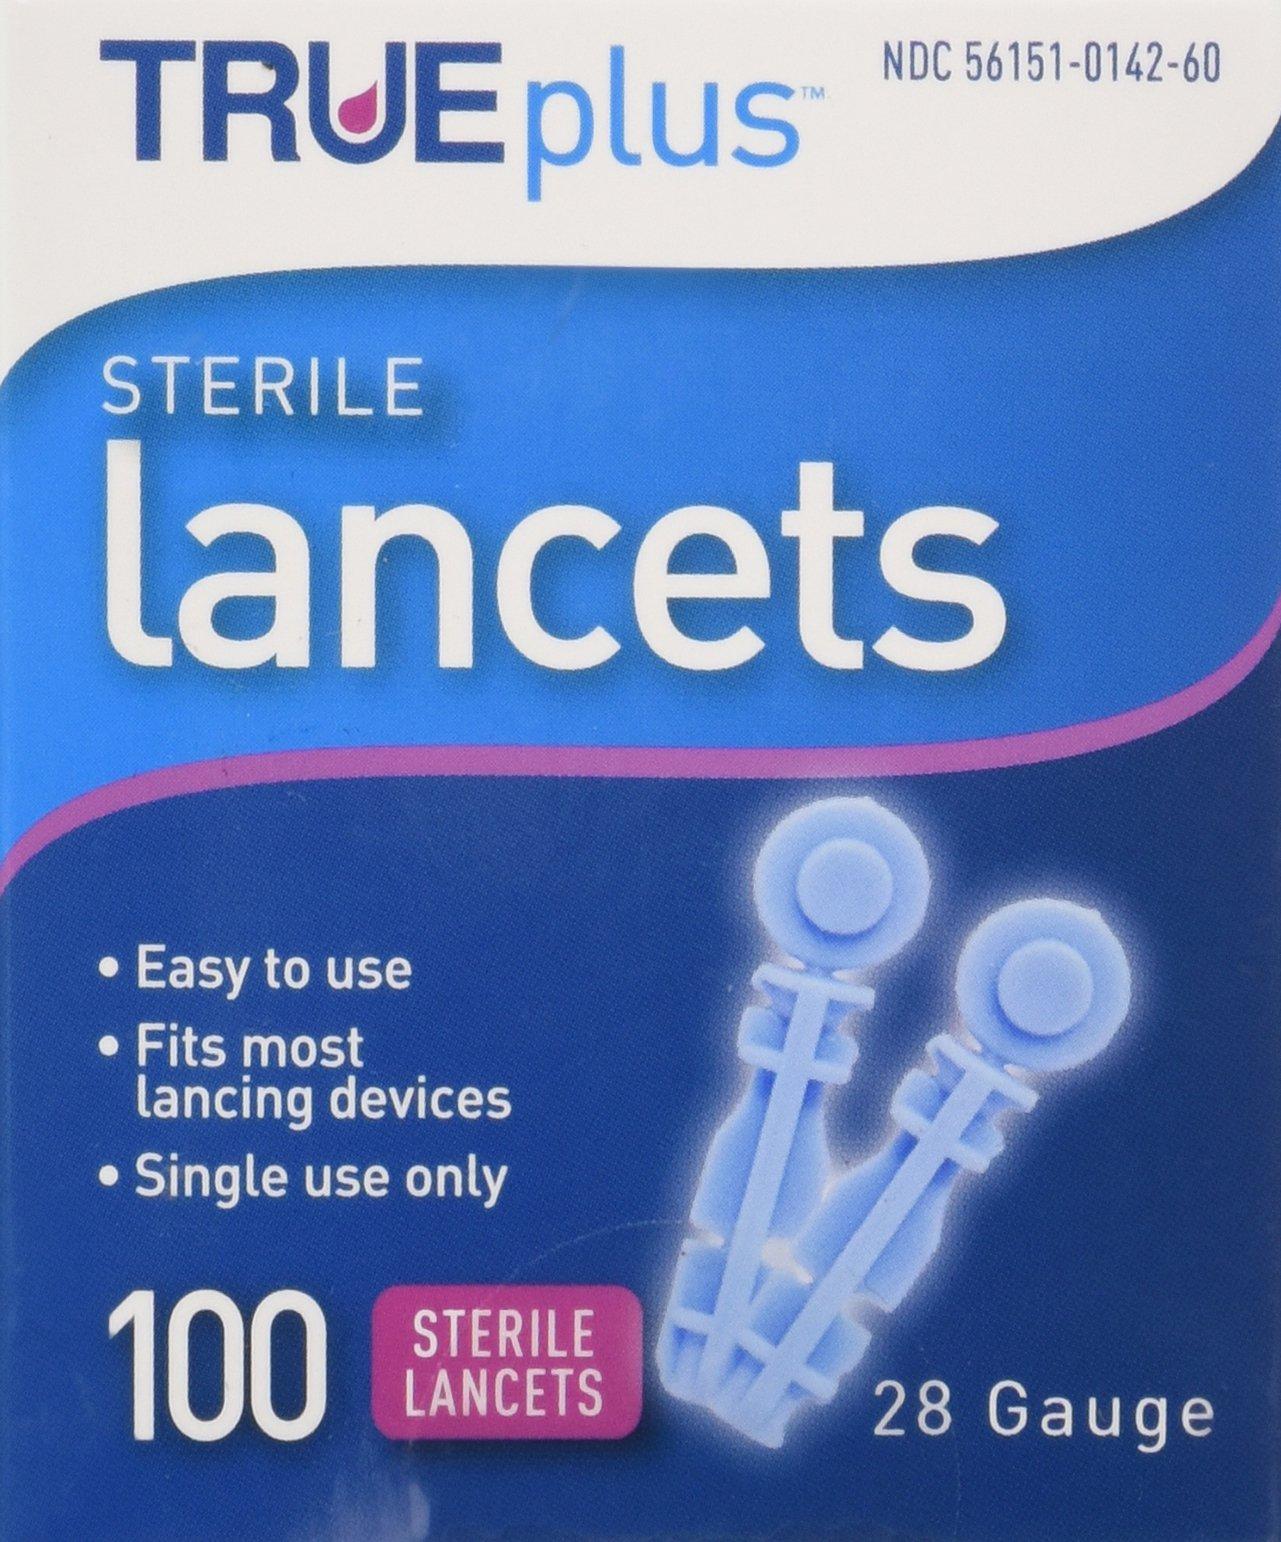 Trueplus Sterile Lancets, 28 Gauge, 100 Each